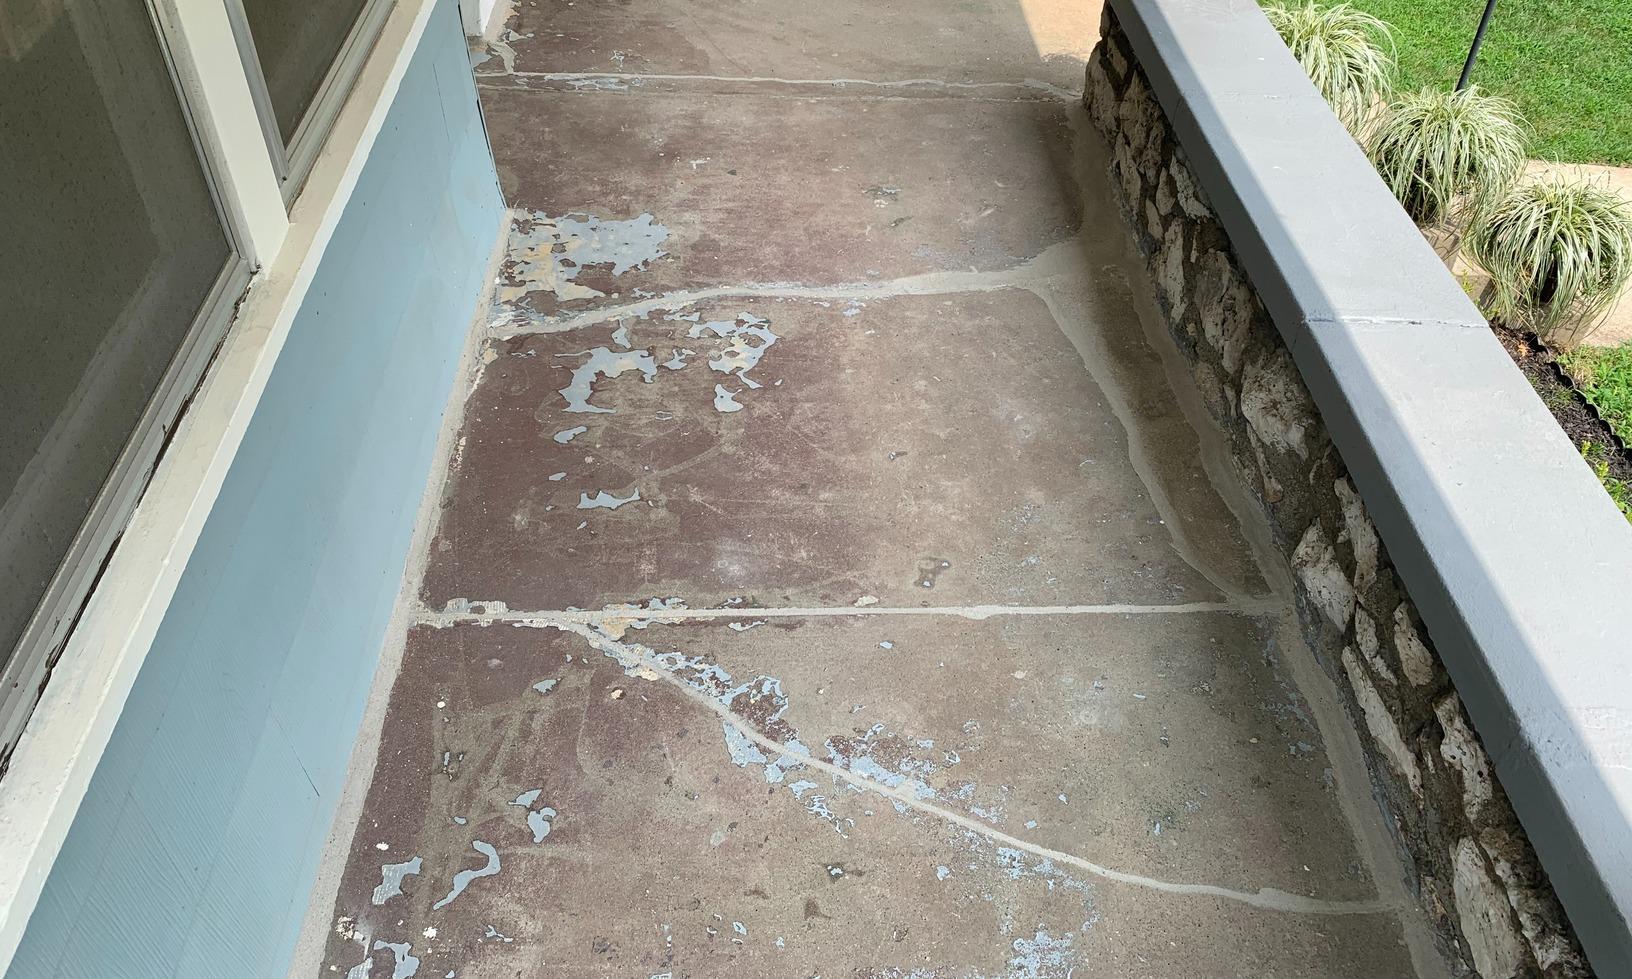 Concrete Repair Services Kansas City, MO - After Photo